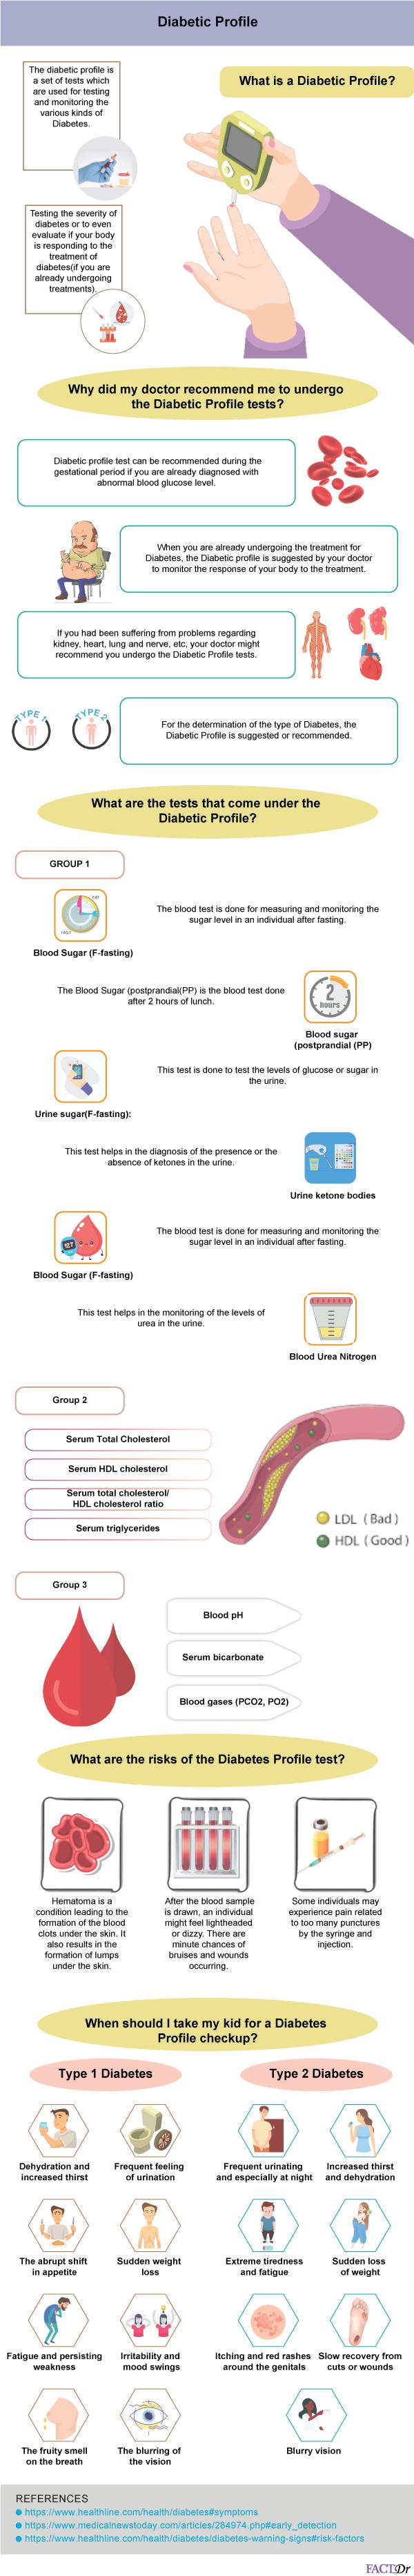 diabetic profile tests